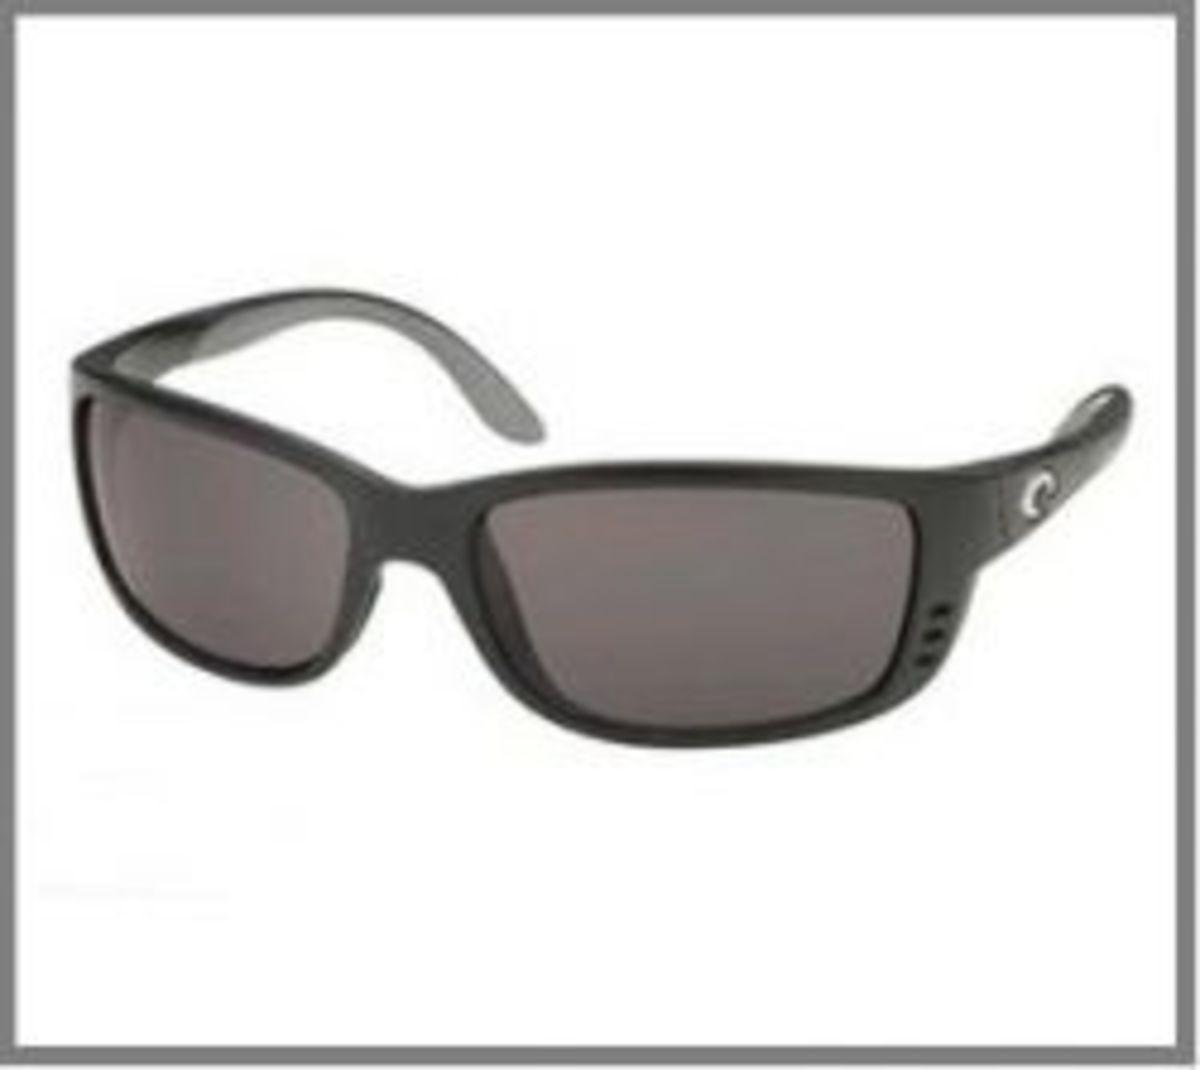 Coasta Del Mar Sunglasses to help my Photophobia